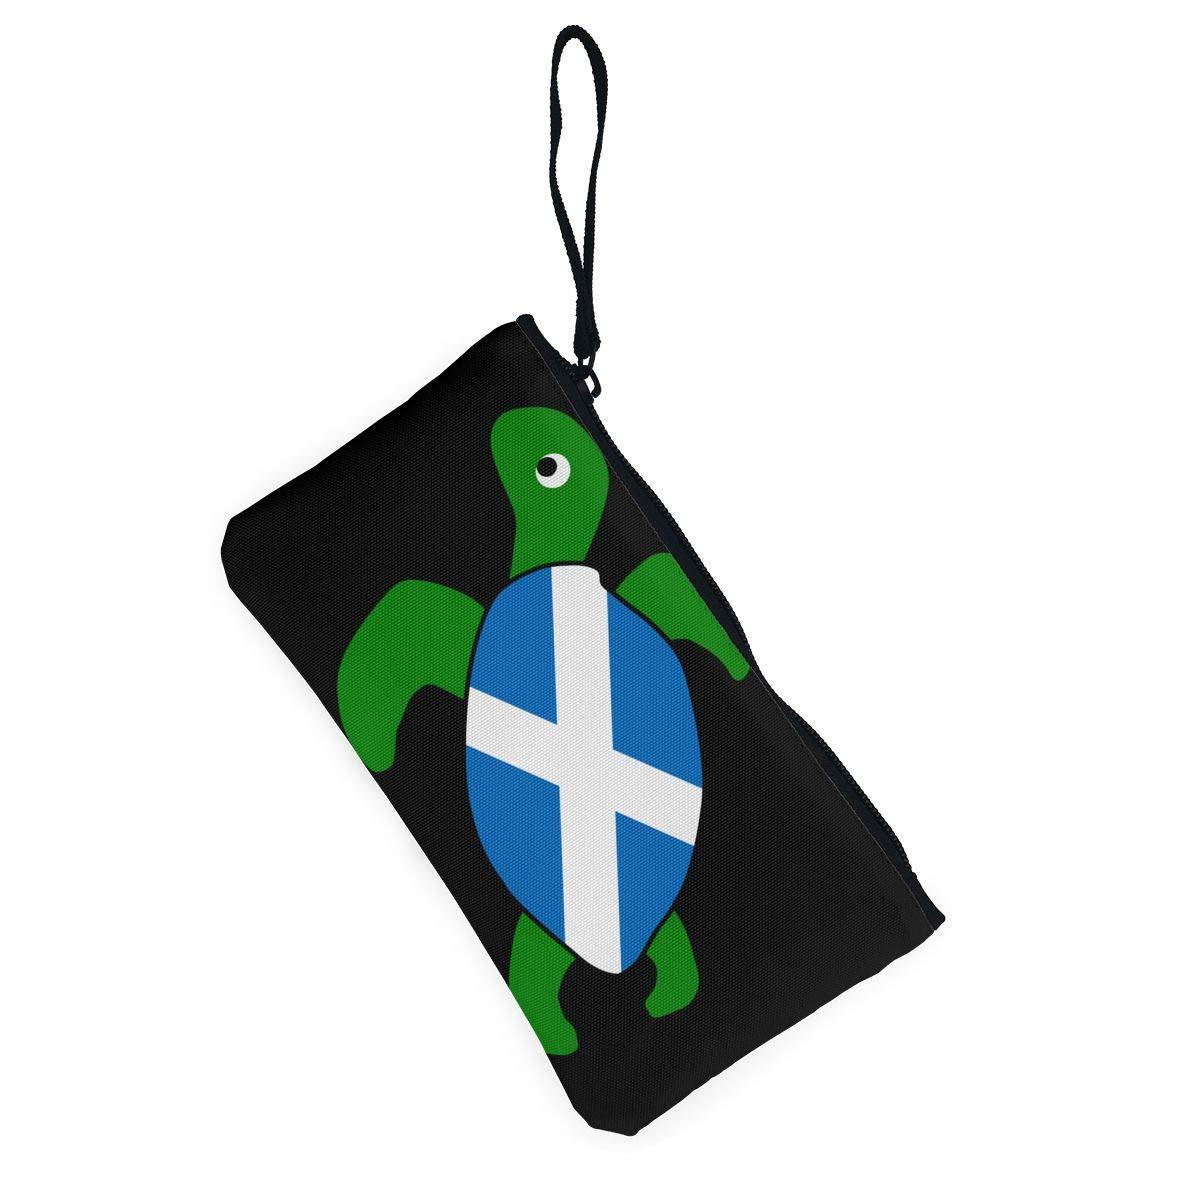 Sea Turtle Scotland Flag Canvas Coin Purse Cute Change Pouch Money Cash Bag Multifunctional Cellphone Bag with Handle